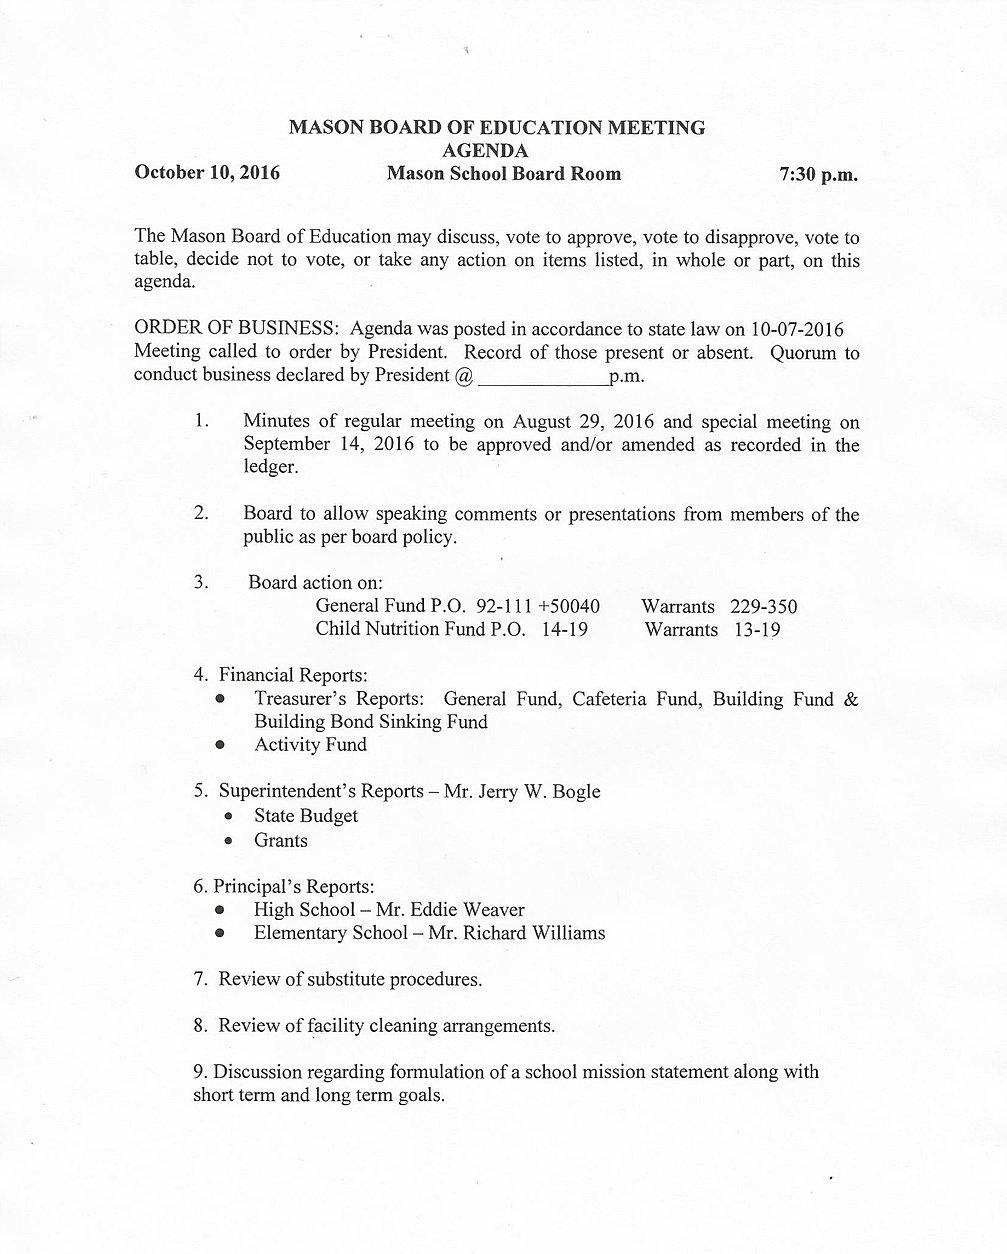 mason website 2 board of education board agenda 10 pg 1